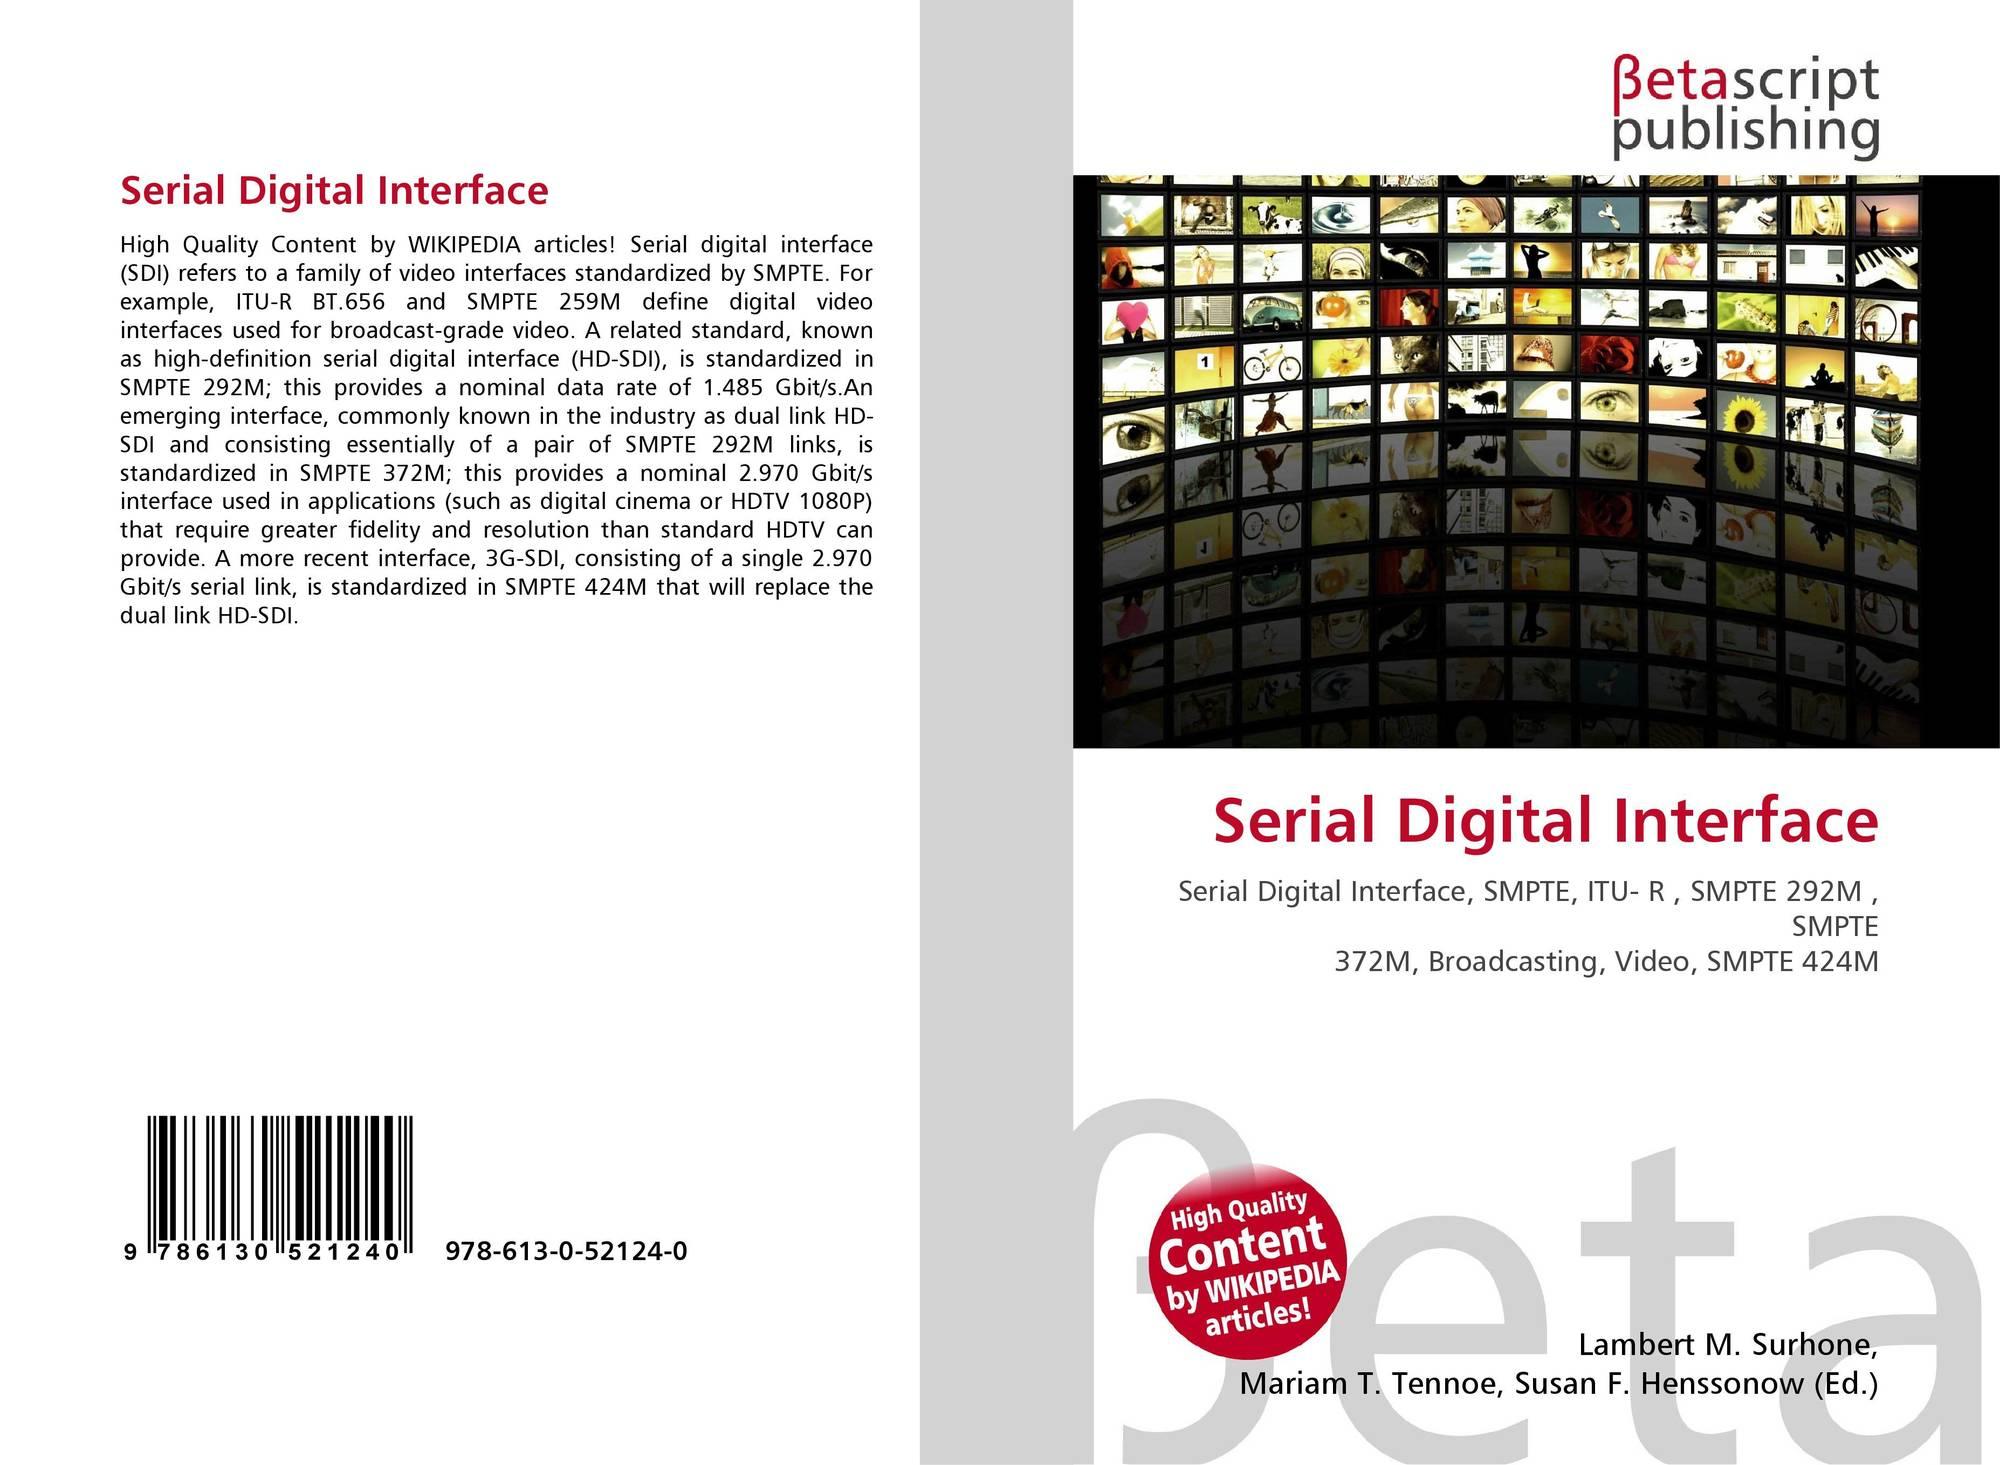 Serial Digital Interface, 978-...